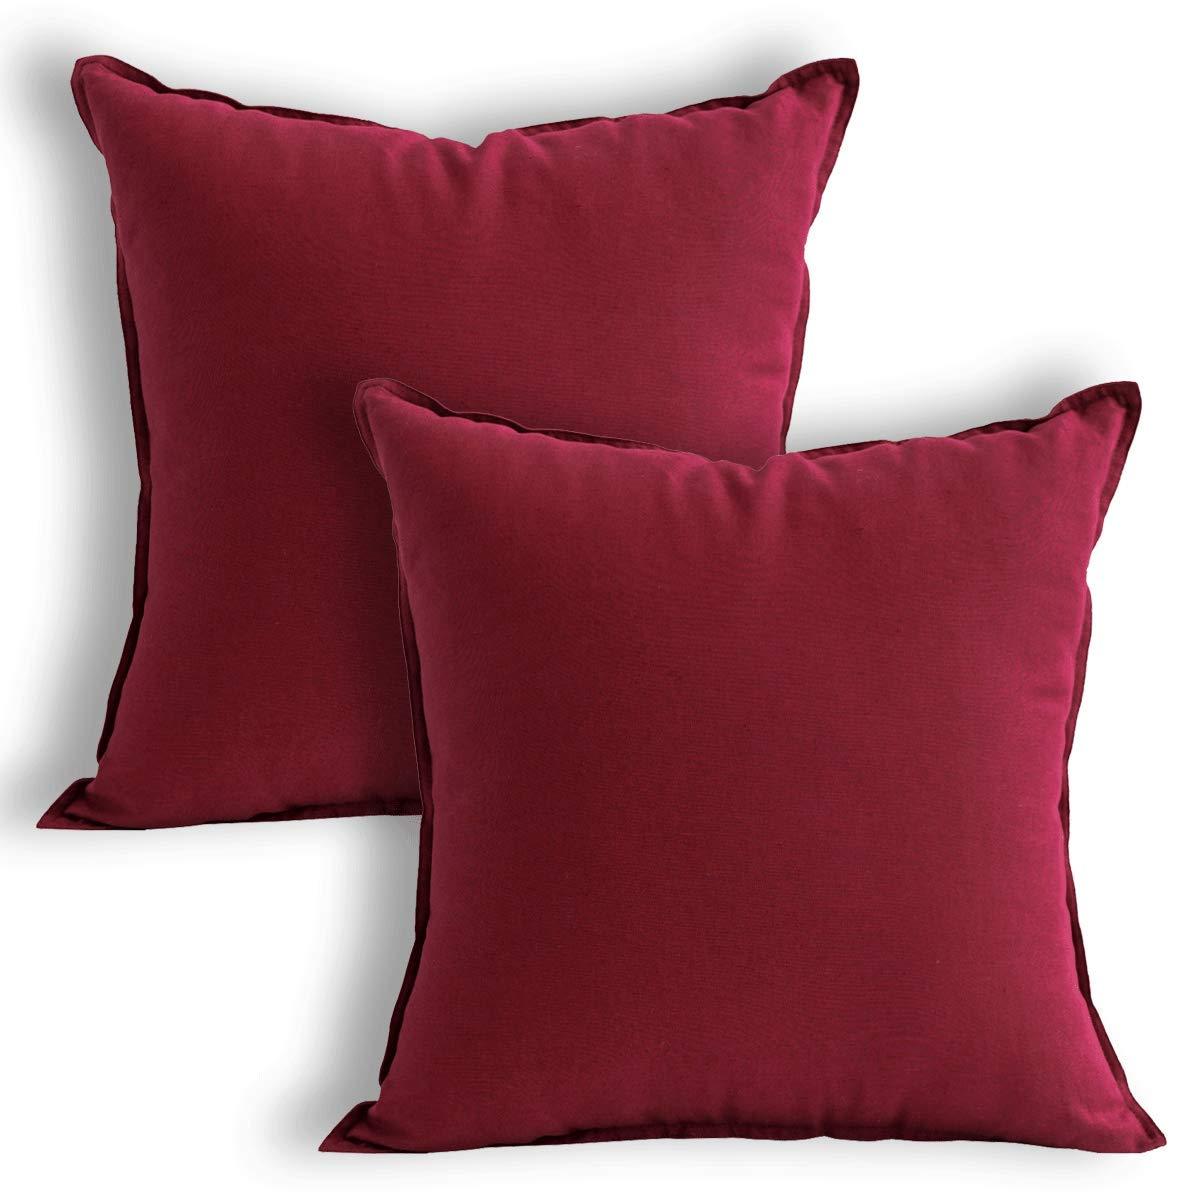 Jeanerlor Cotton Linen Decoration Toss Throw Pillow Sham 18''x18'' Cushion Case Cool Pillow Cover Delicate Decorative Pillowcase Children/Kid/Baby, (45 x 45cm) 2 Packs Burgundy